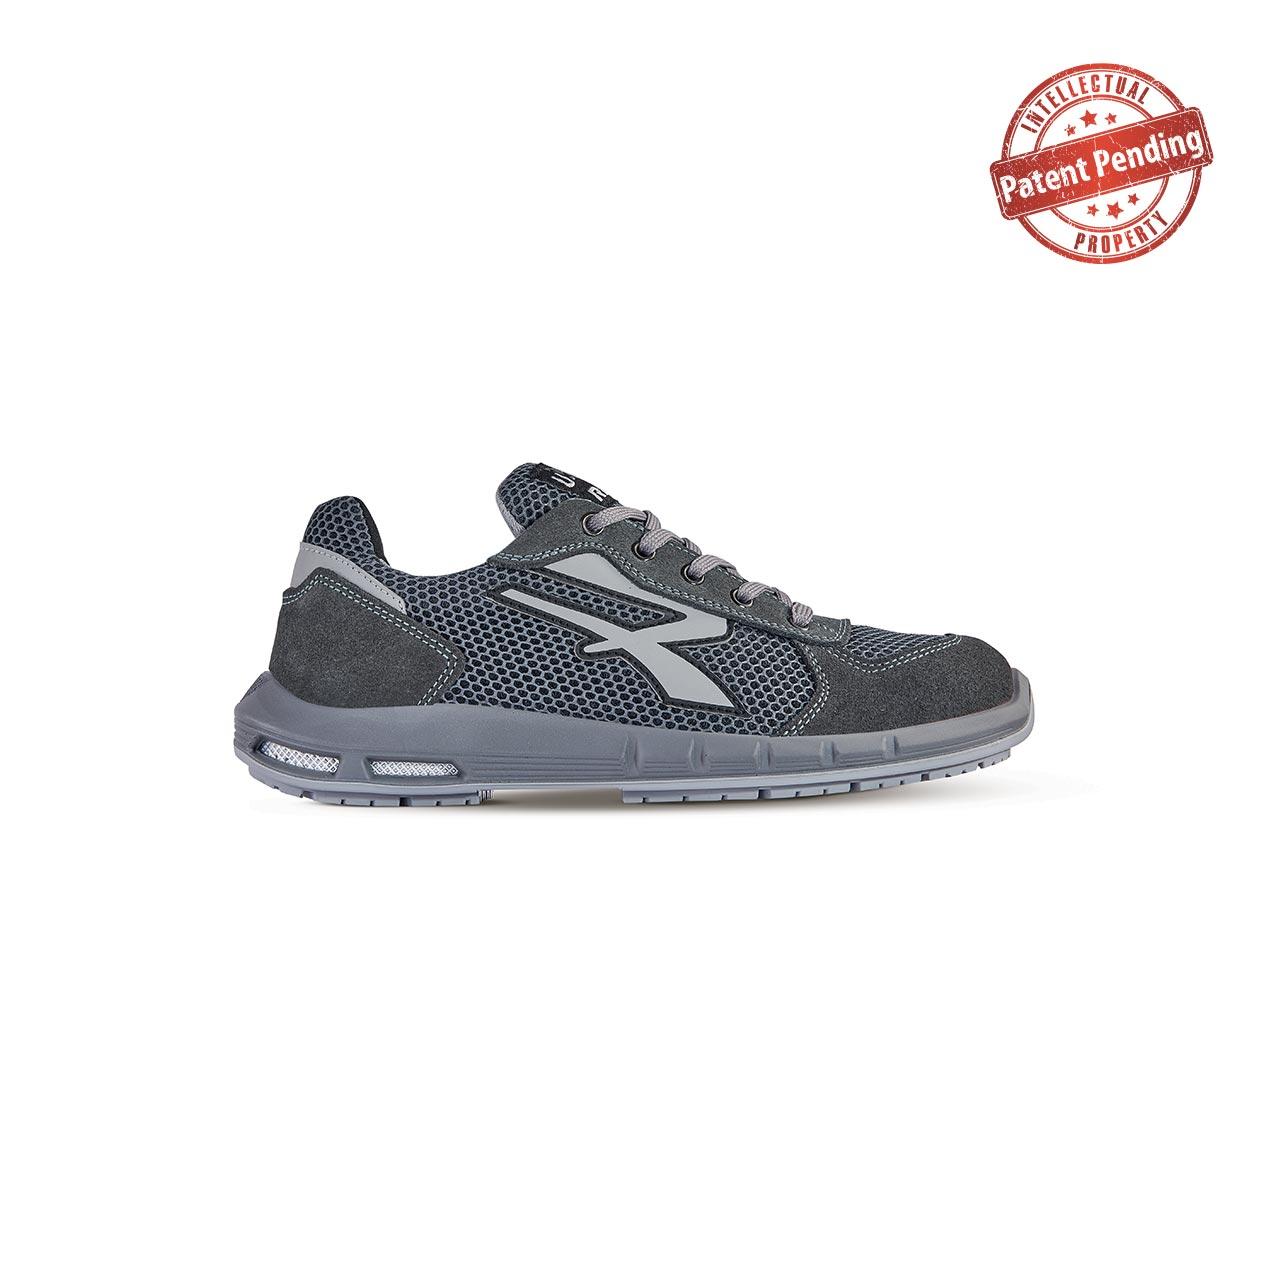 scarpa antinfortunistica upower modello draco plus linea redup plus vista laterale